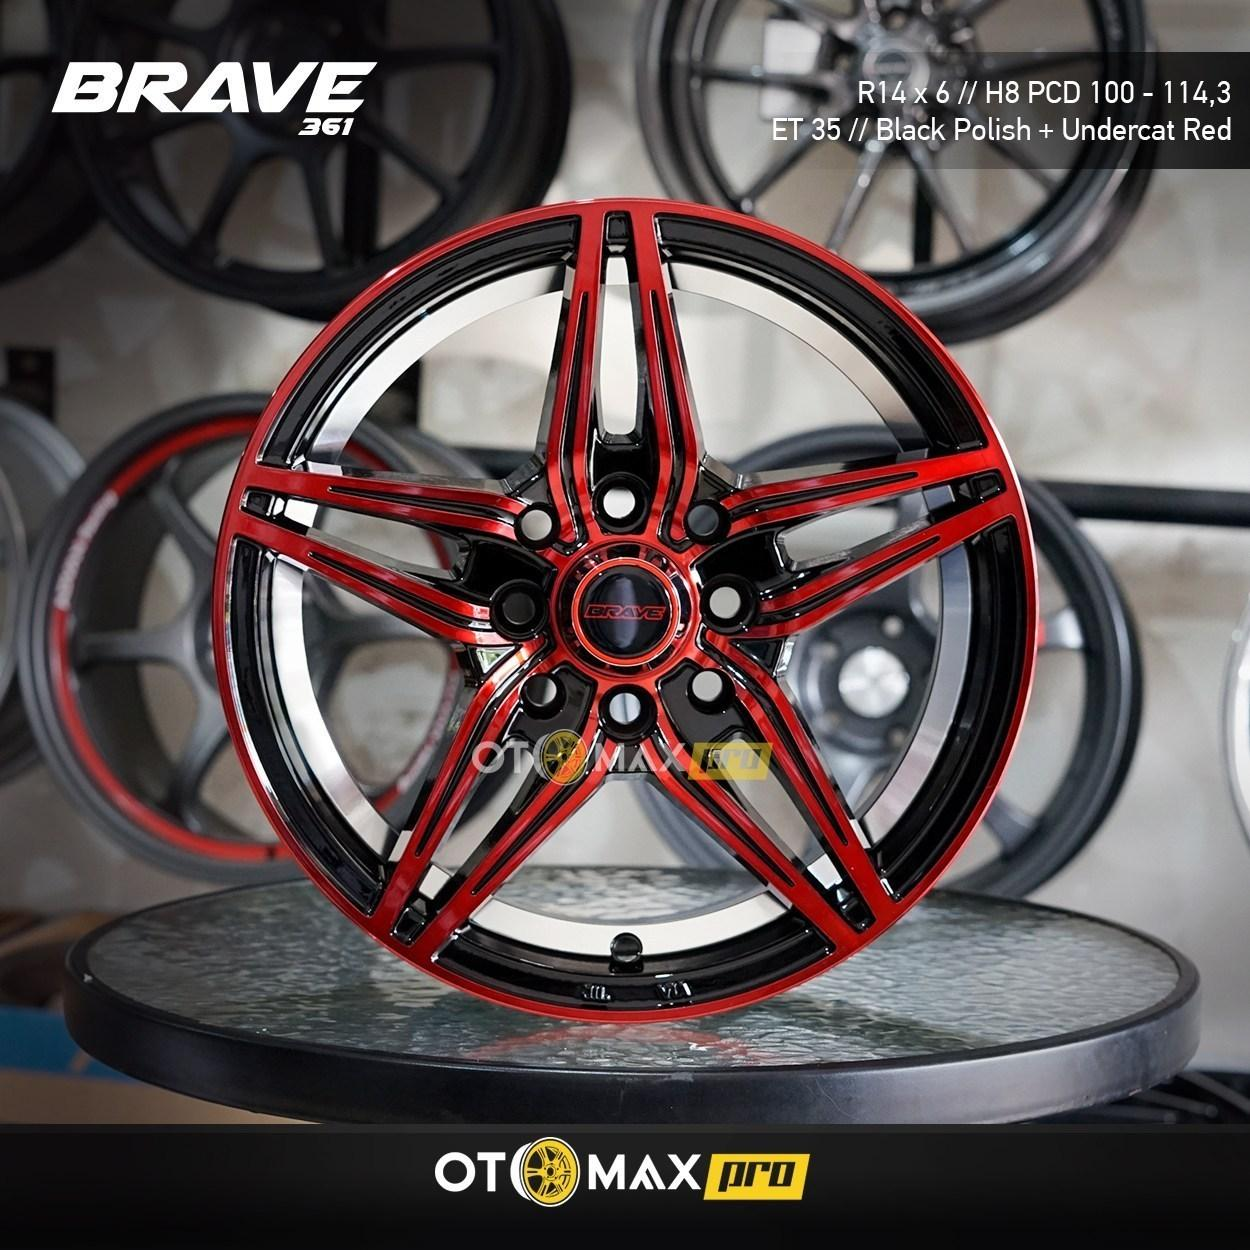 Velg Mobil Brave (361) Ring 14 Black Polish + Undercat Red